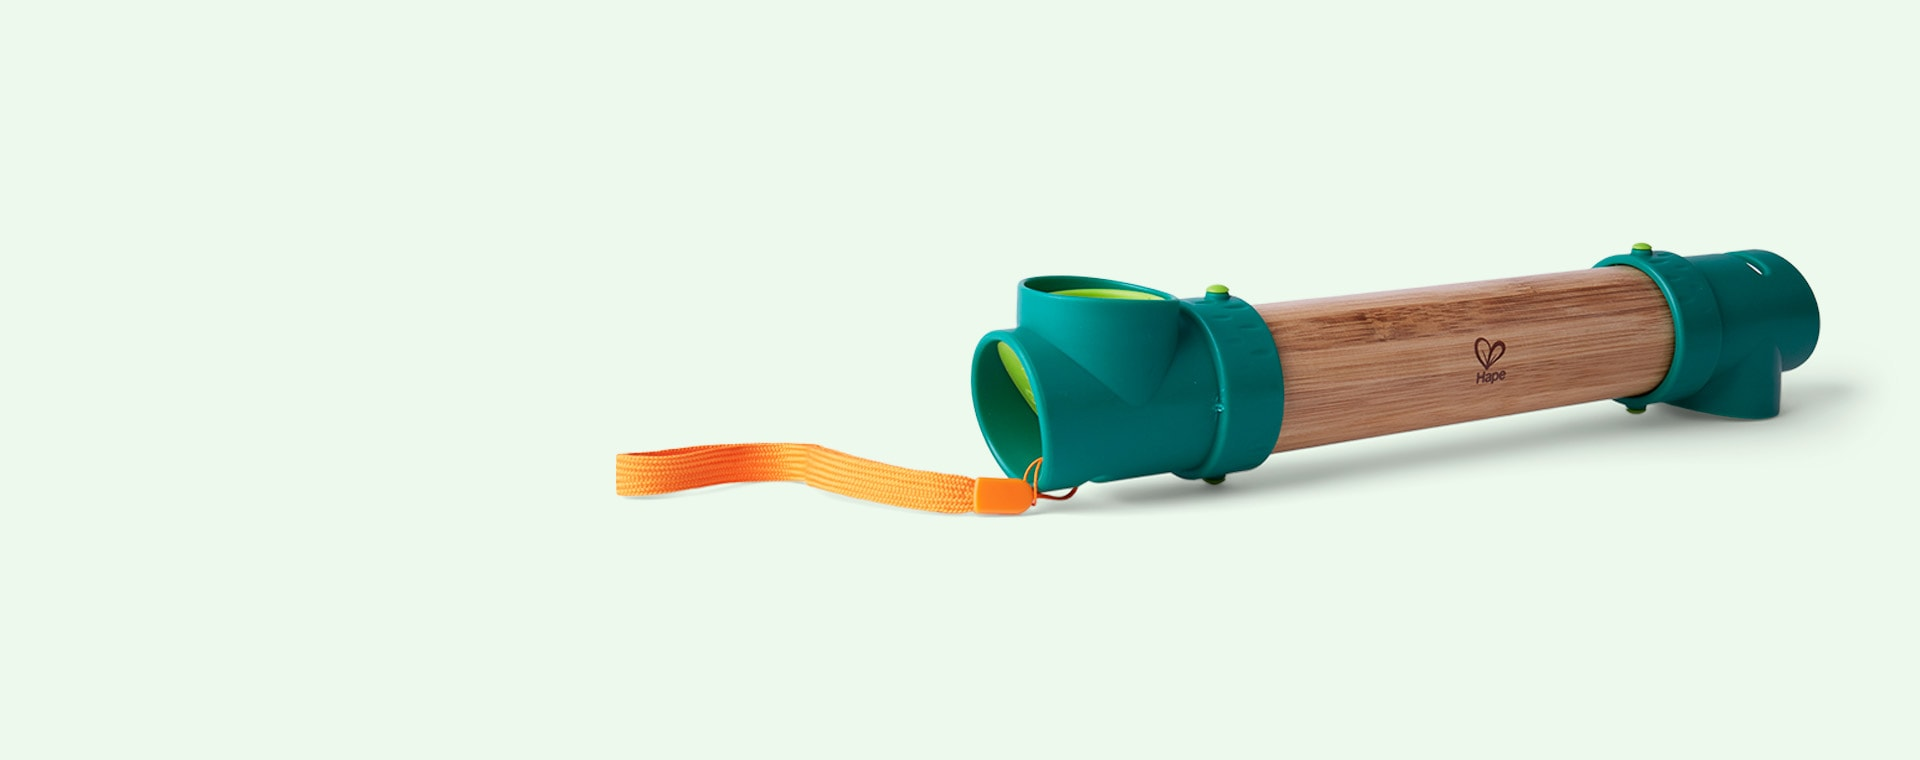 Green Hape Hide and Seek Periscope